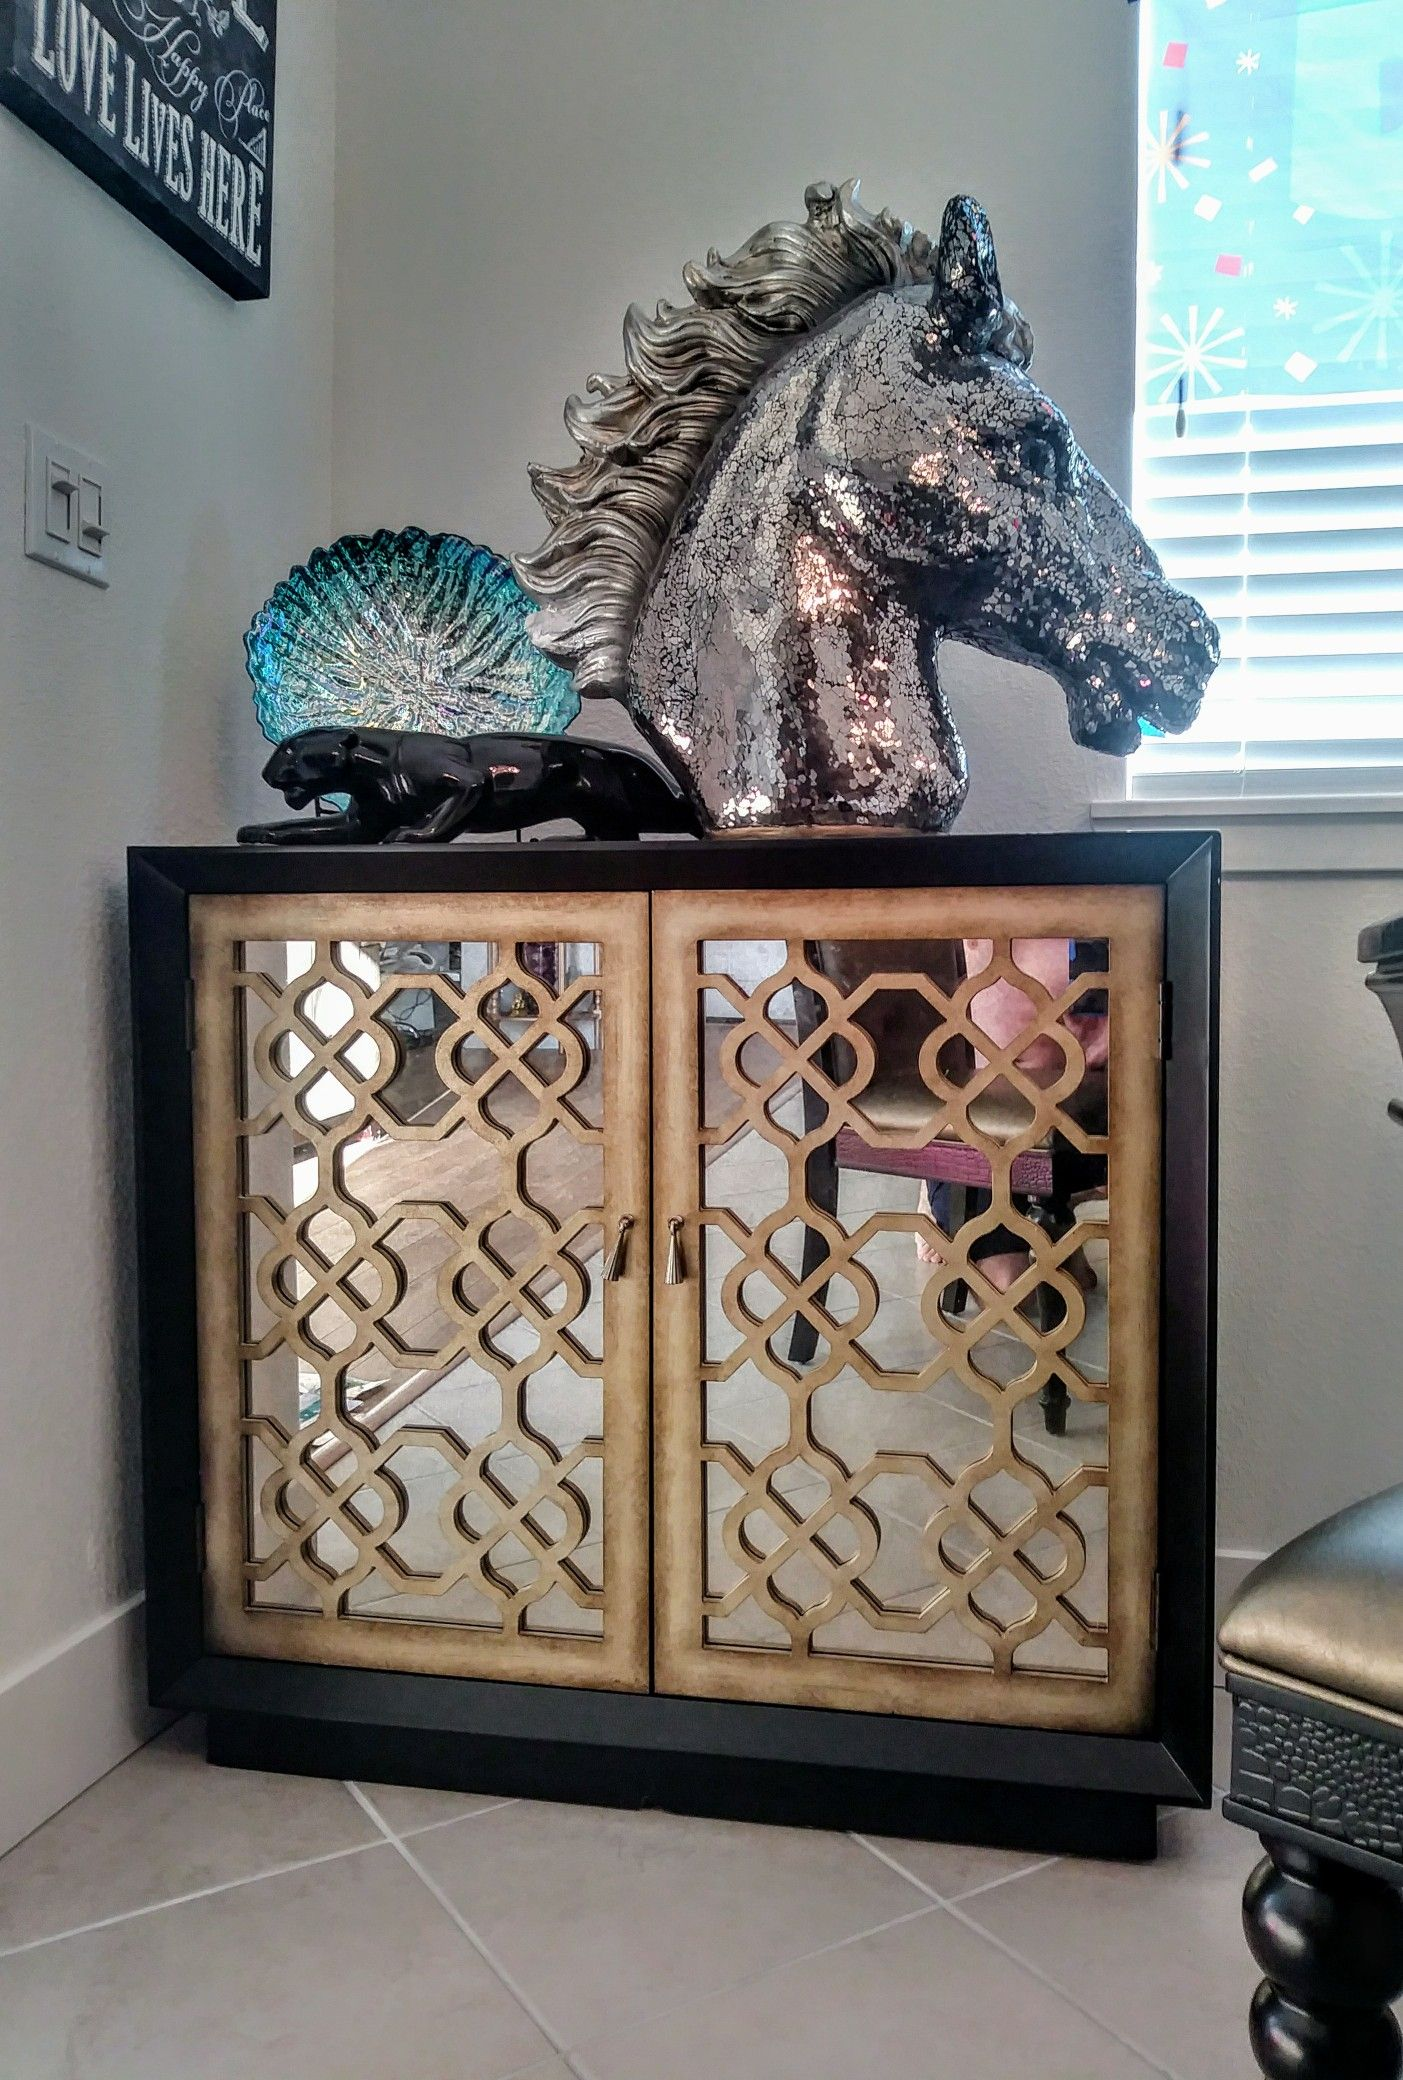 Designed By Jeston Whitacre Glass Horse From Ashley Furniture In Woodbridge Va Aqua Shell Decor From World Market Shell Decor Ashley Furniture Wood Bridge